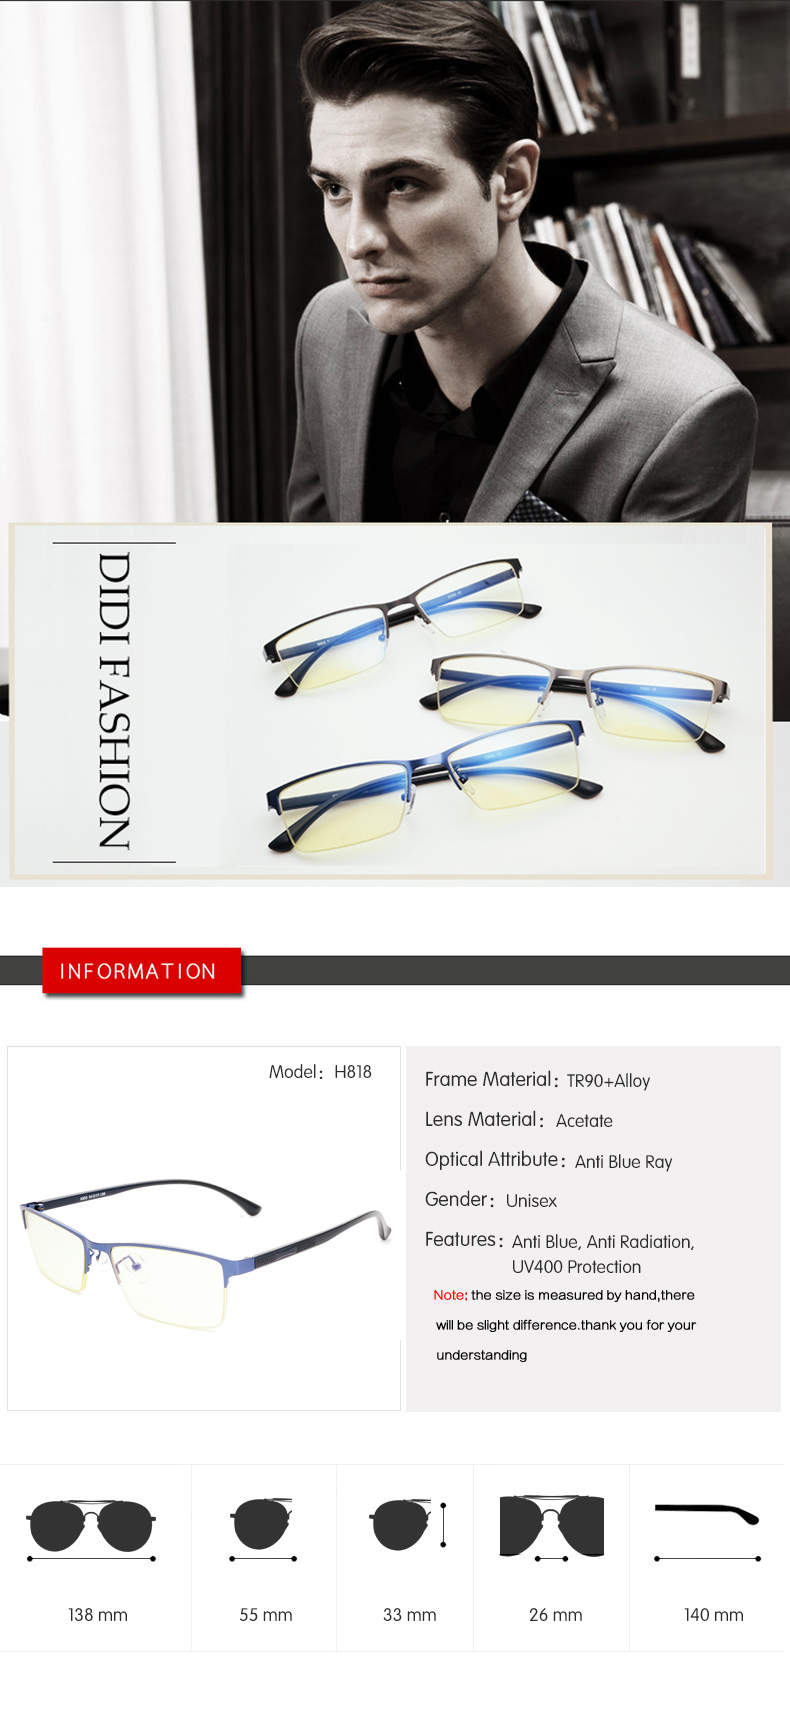 7c7b24ed9f3 DIDI 2018 Eyeglasses Half Business Men Computer Anti Blue Glasses ...